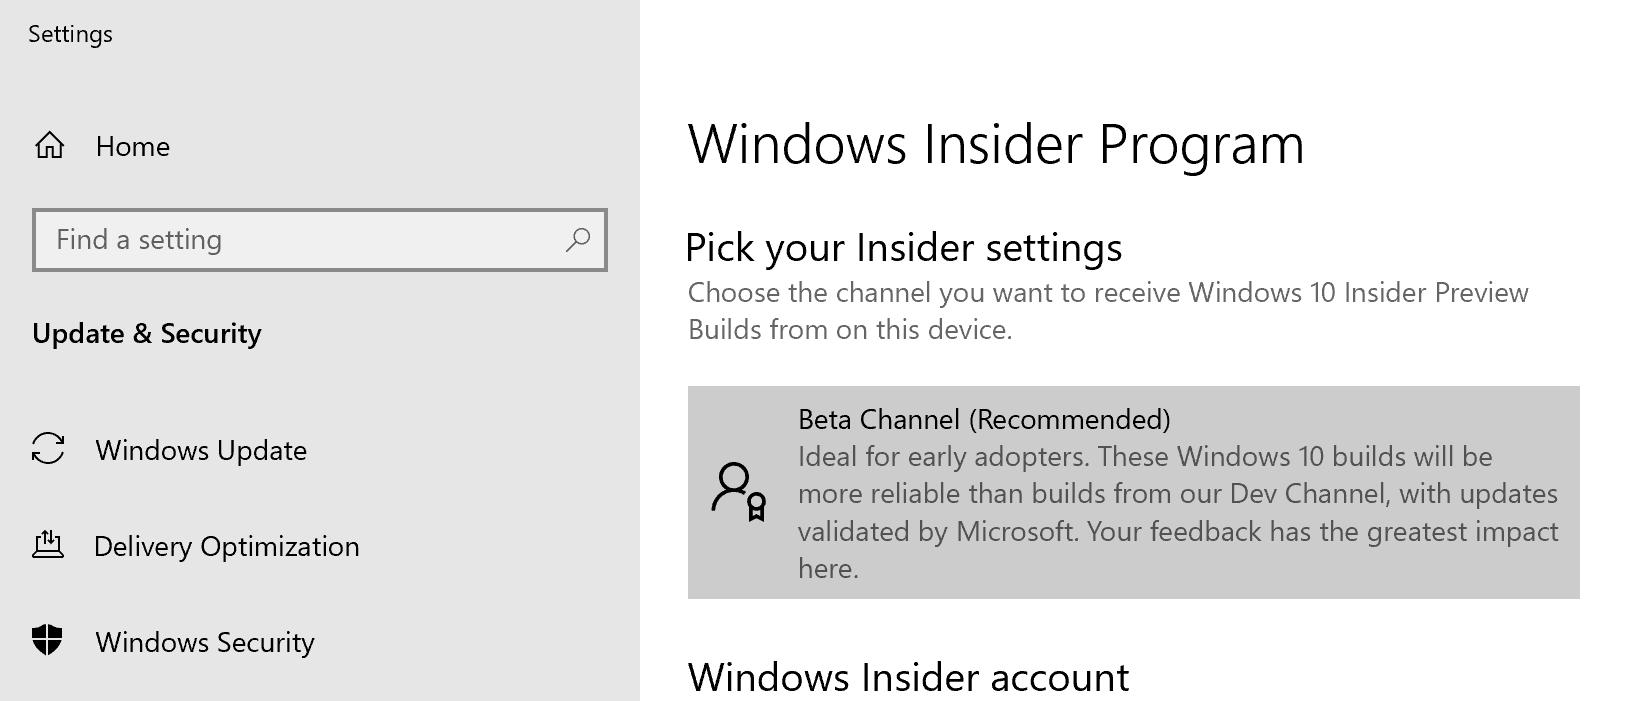 Windows Insider Beta Channel